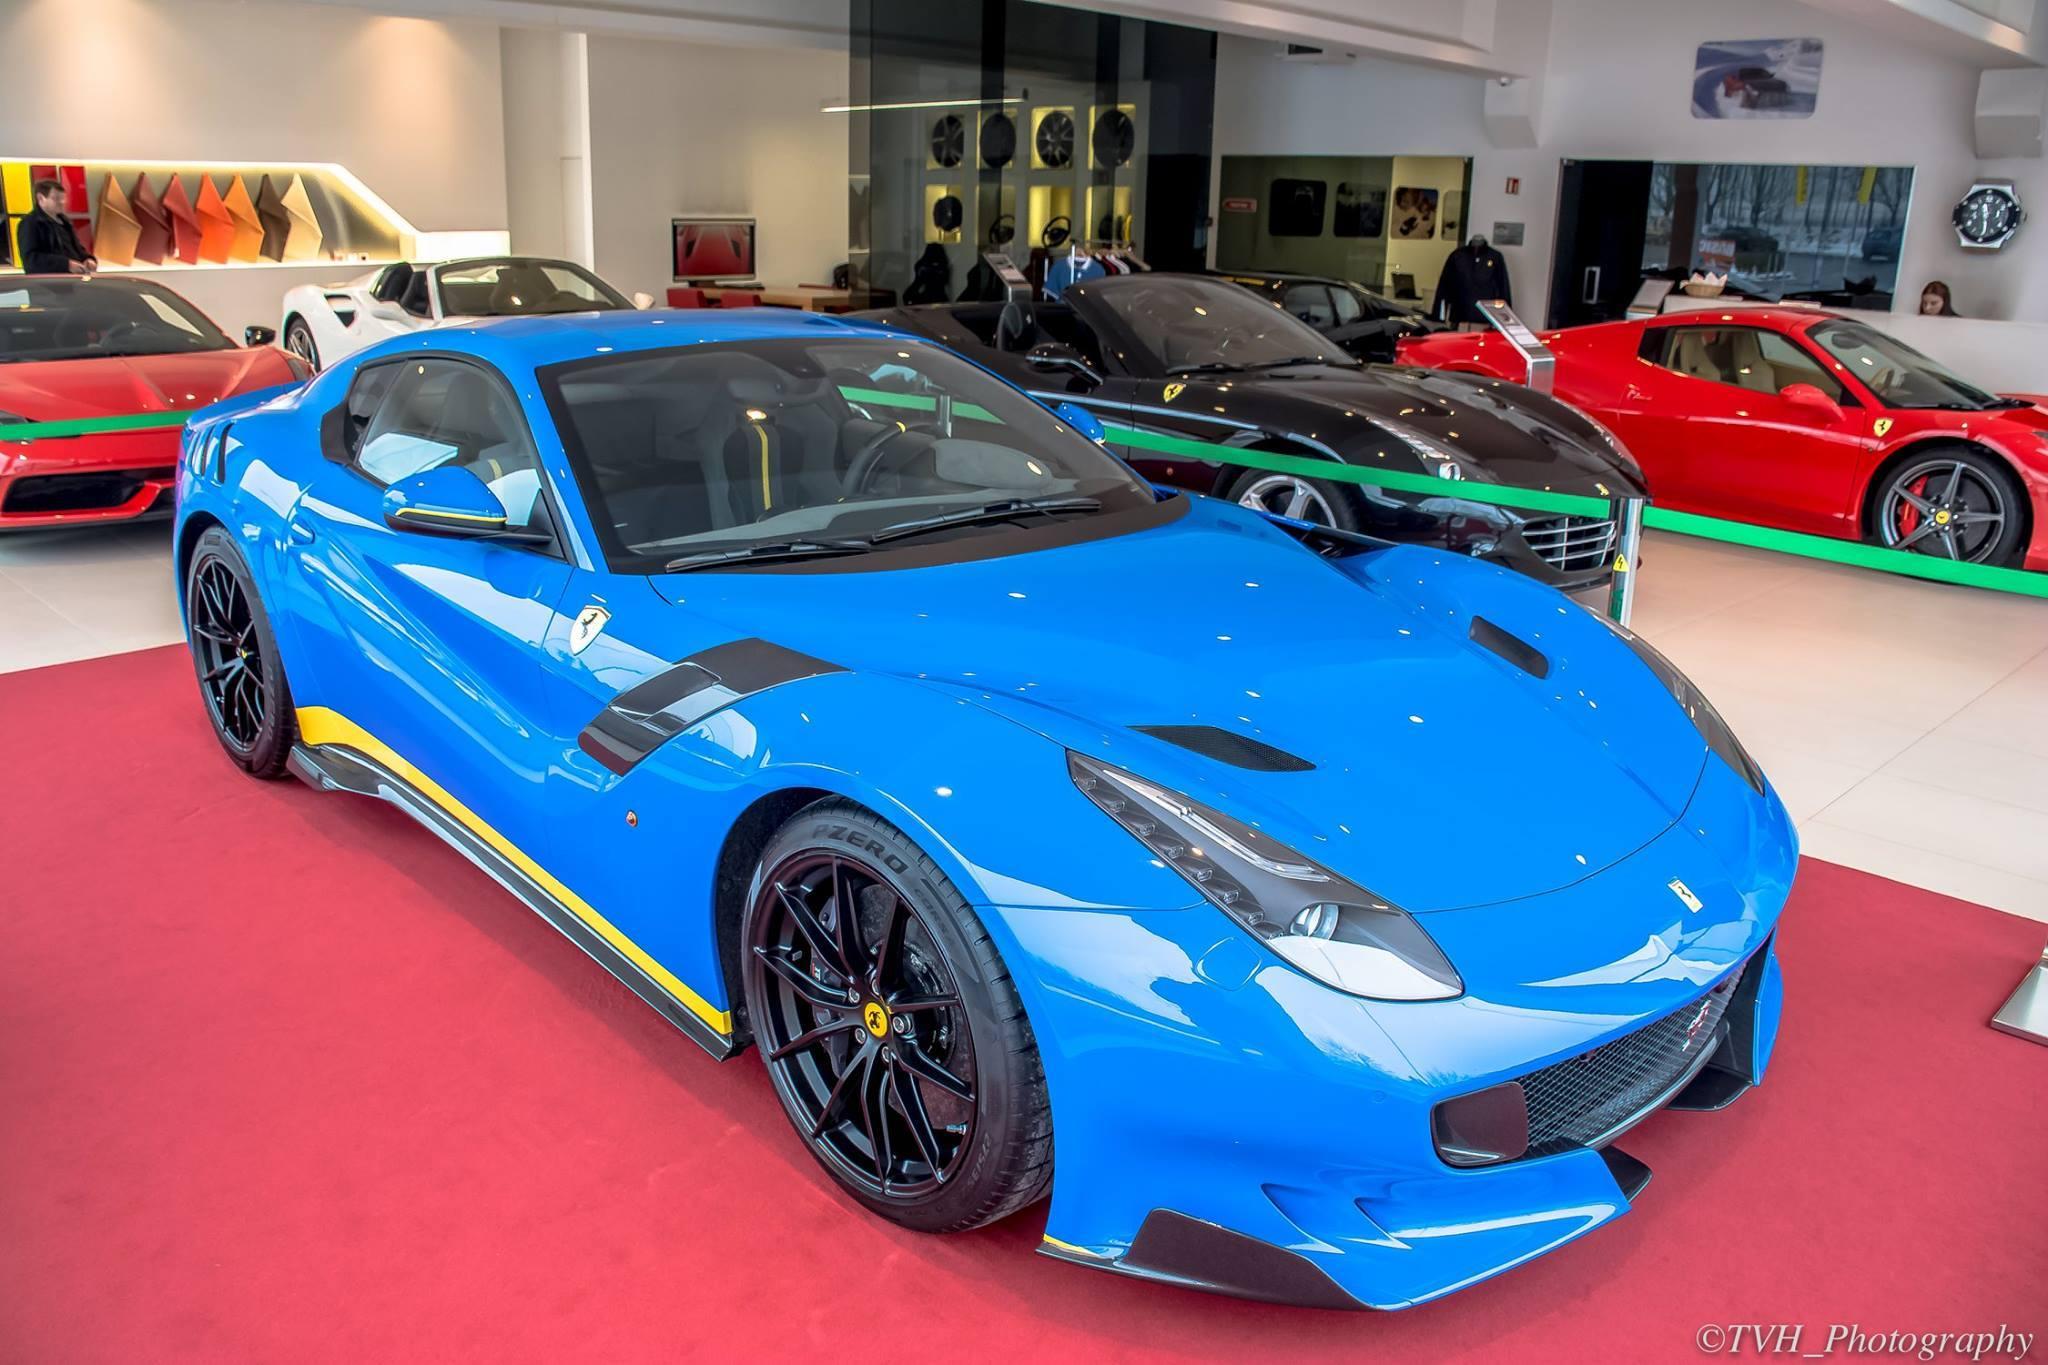 Blue Ferrari F12 TdF Spotted in Luxemburg